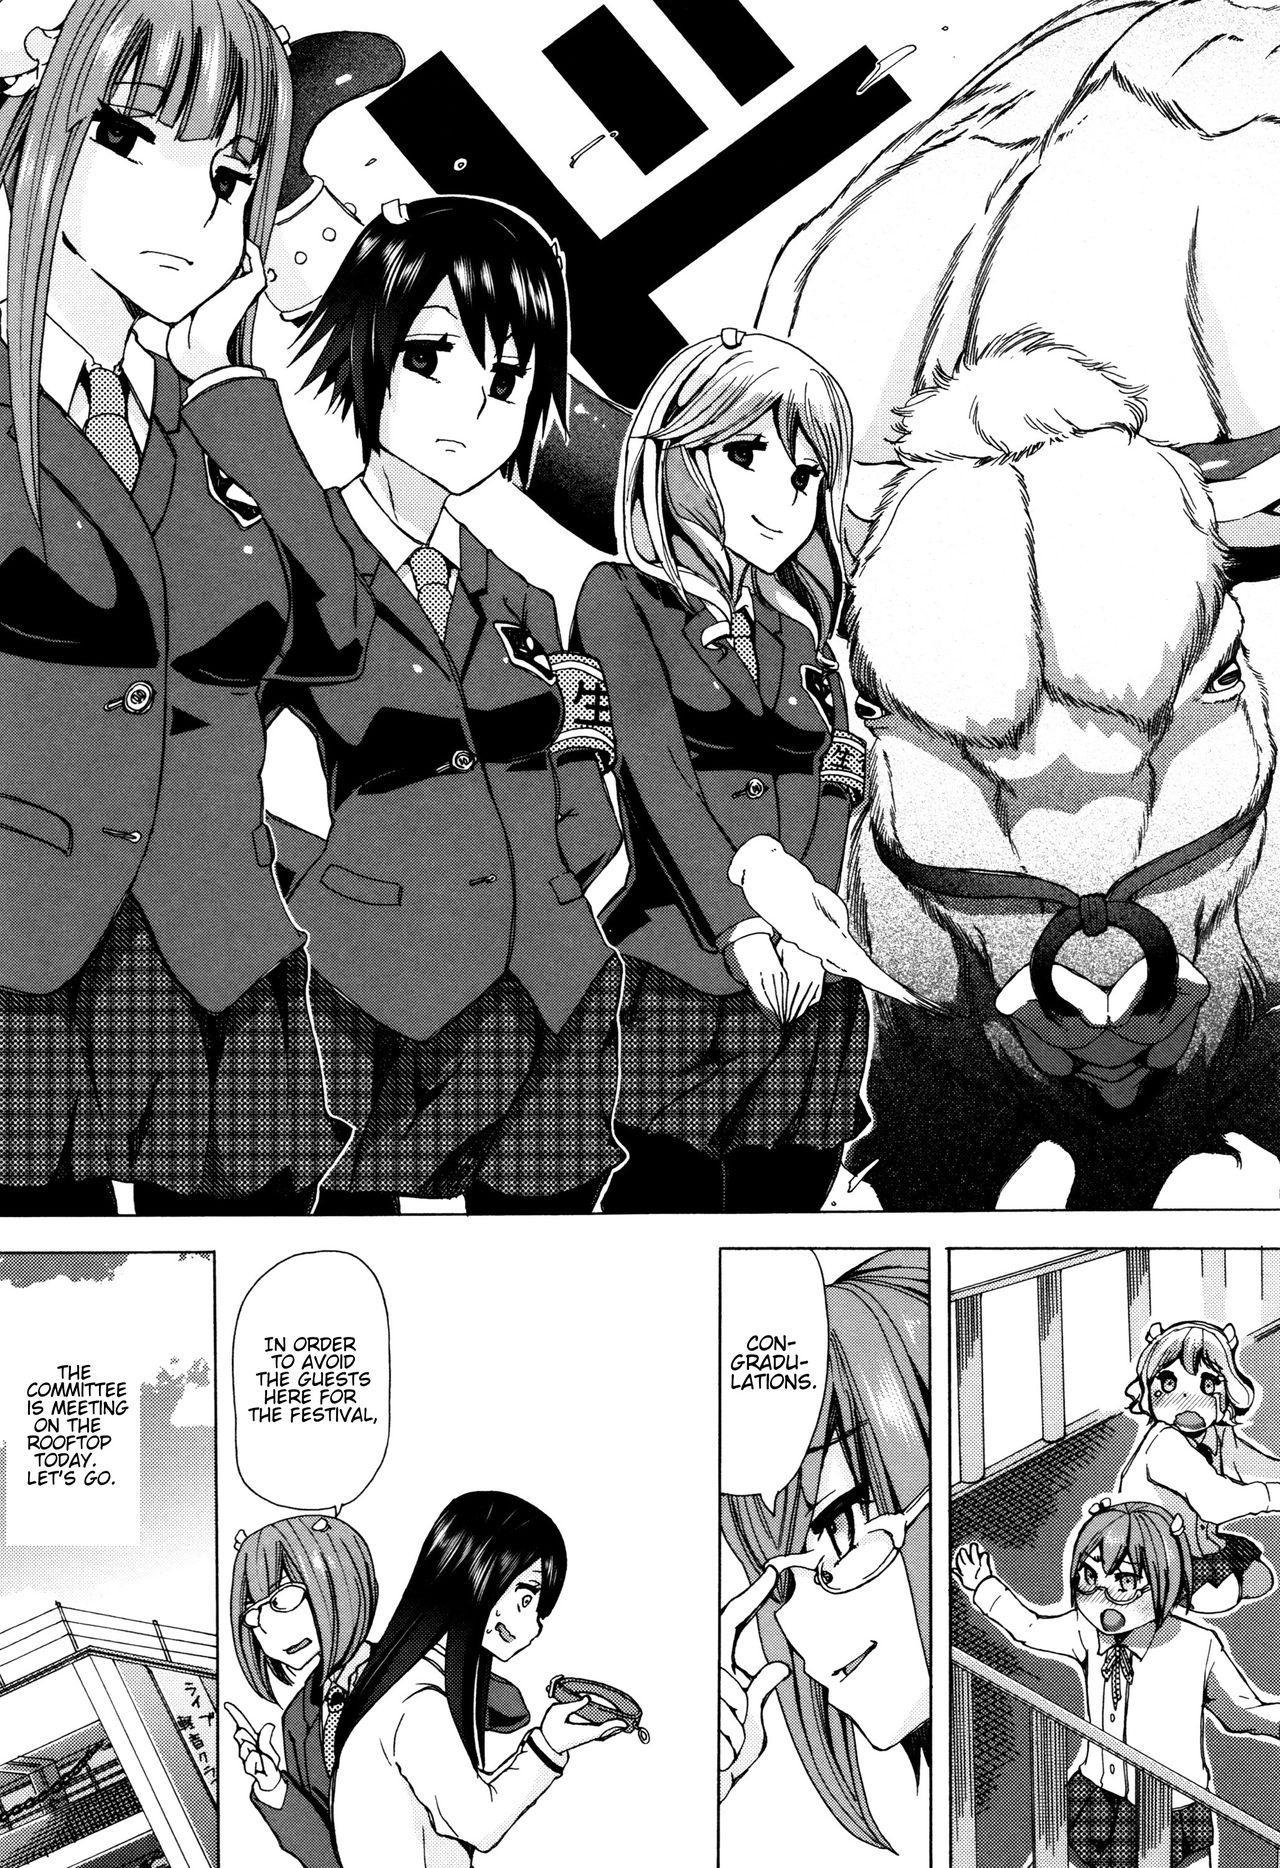 [Chikiko] Juukan Kyoushitsu - Bestiality Classroom Ch. 1-5 [English] [Neeko7] 15